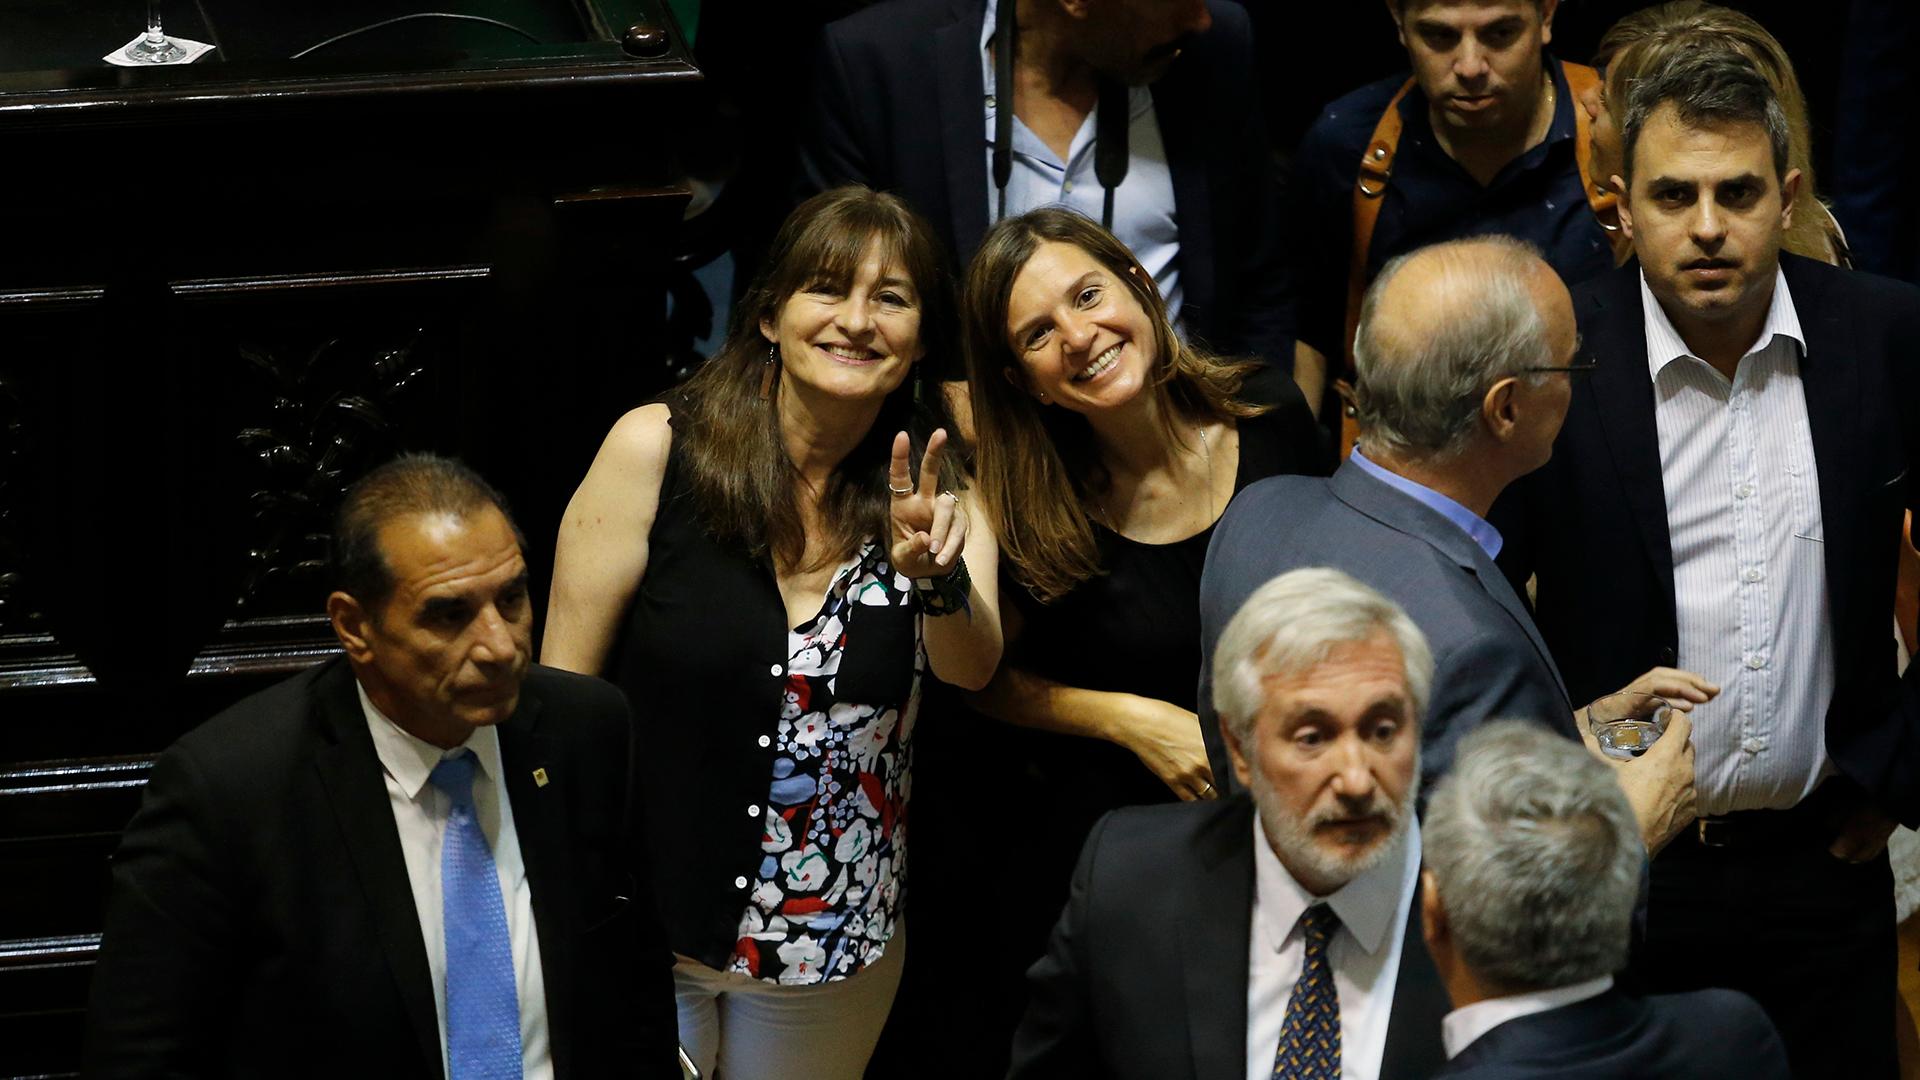 Fernanda Raverta, diputada nacional y ex candidata a intendente de Mar del Plata